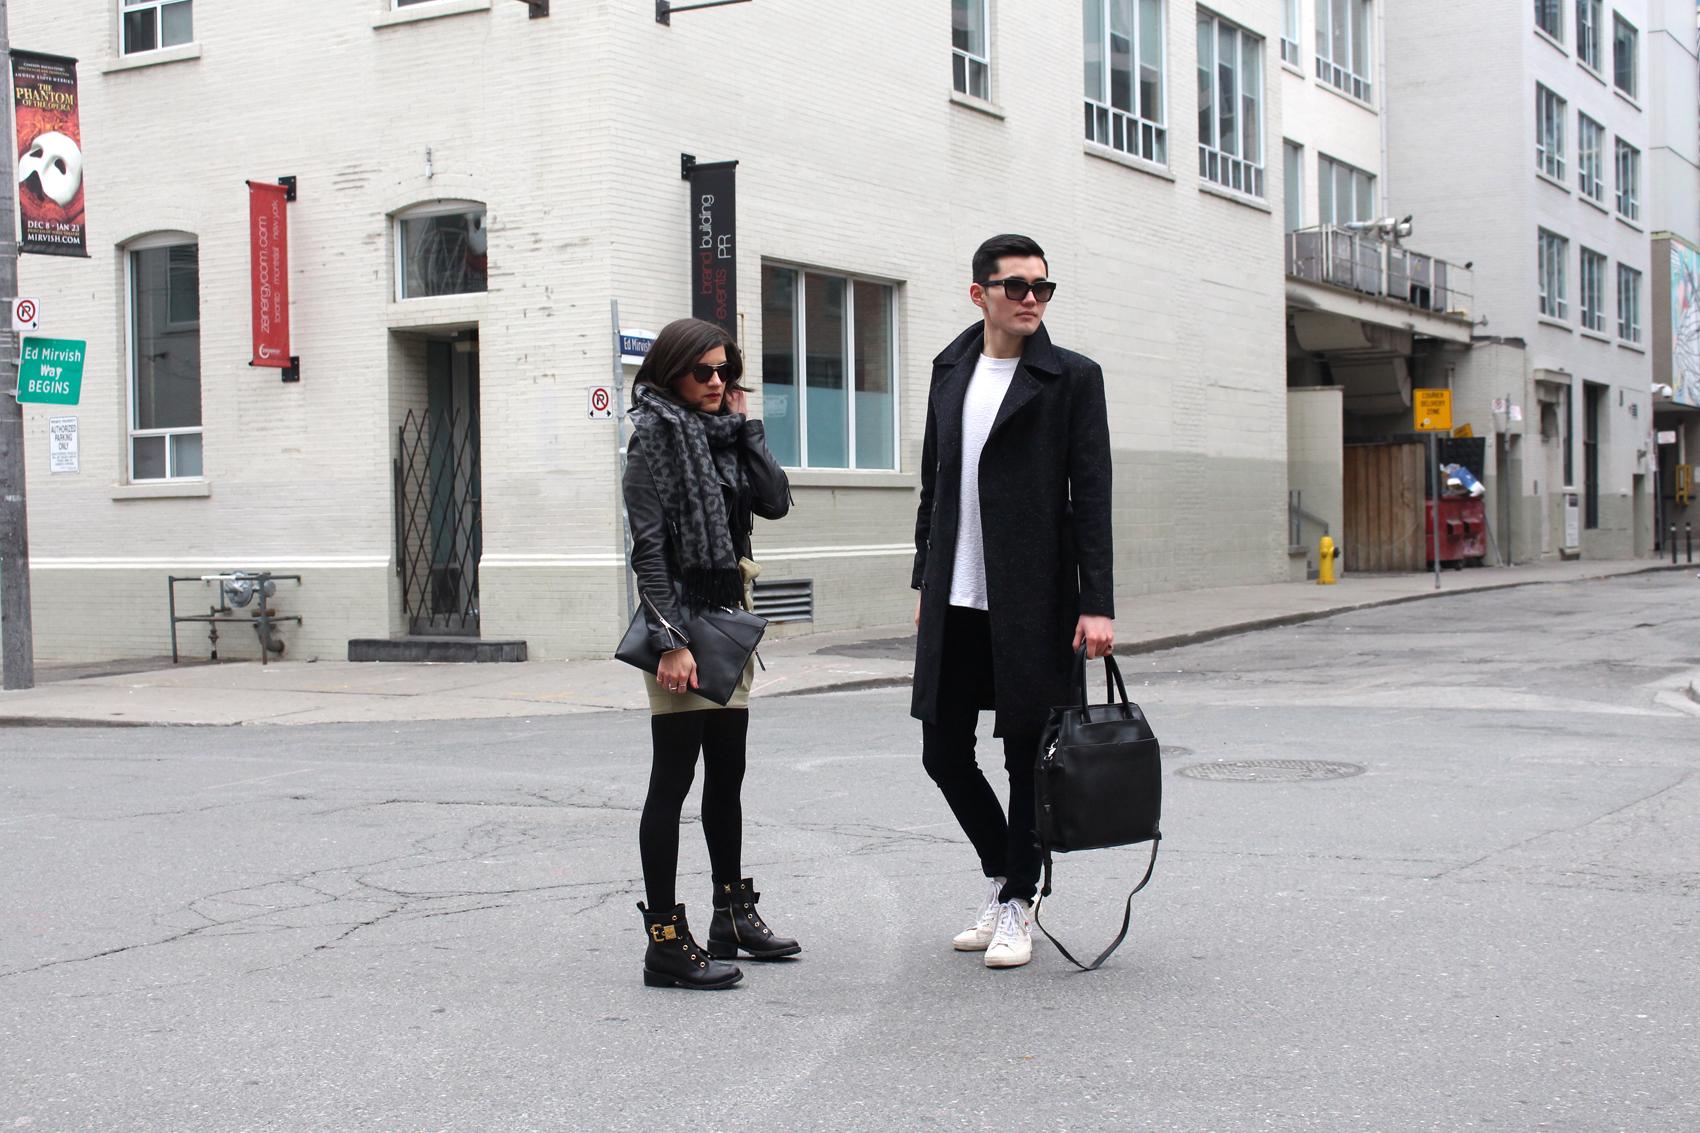 WoahStyle.com-featuring Michael Biro of Global Garcon with Philo handbags-street-style-ootd-toronto blogger_5287.jpg